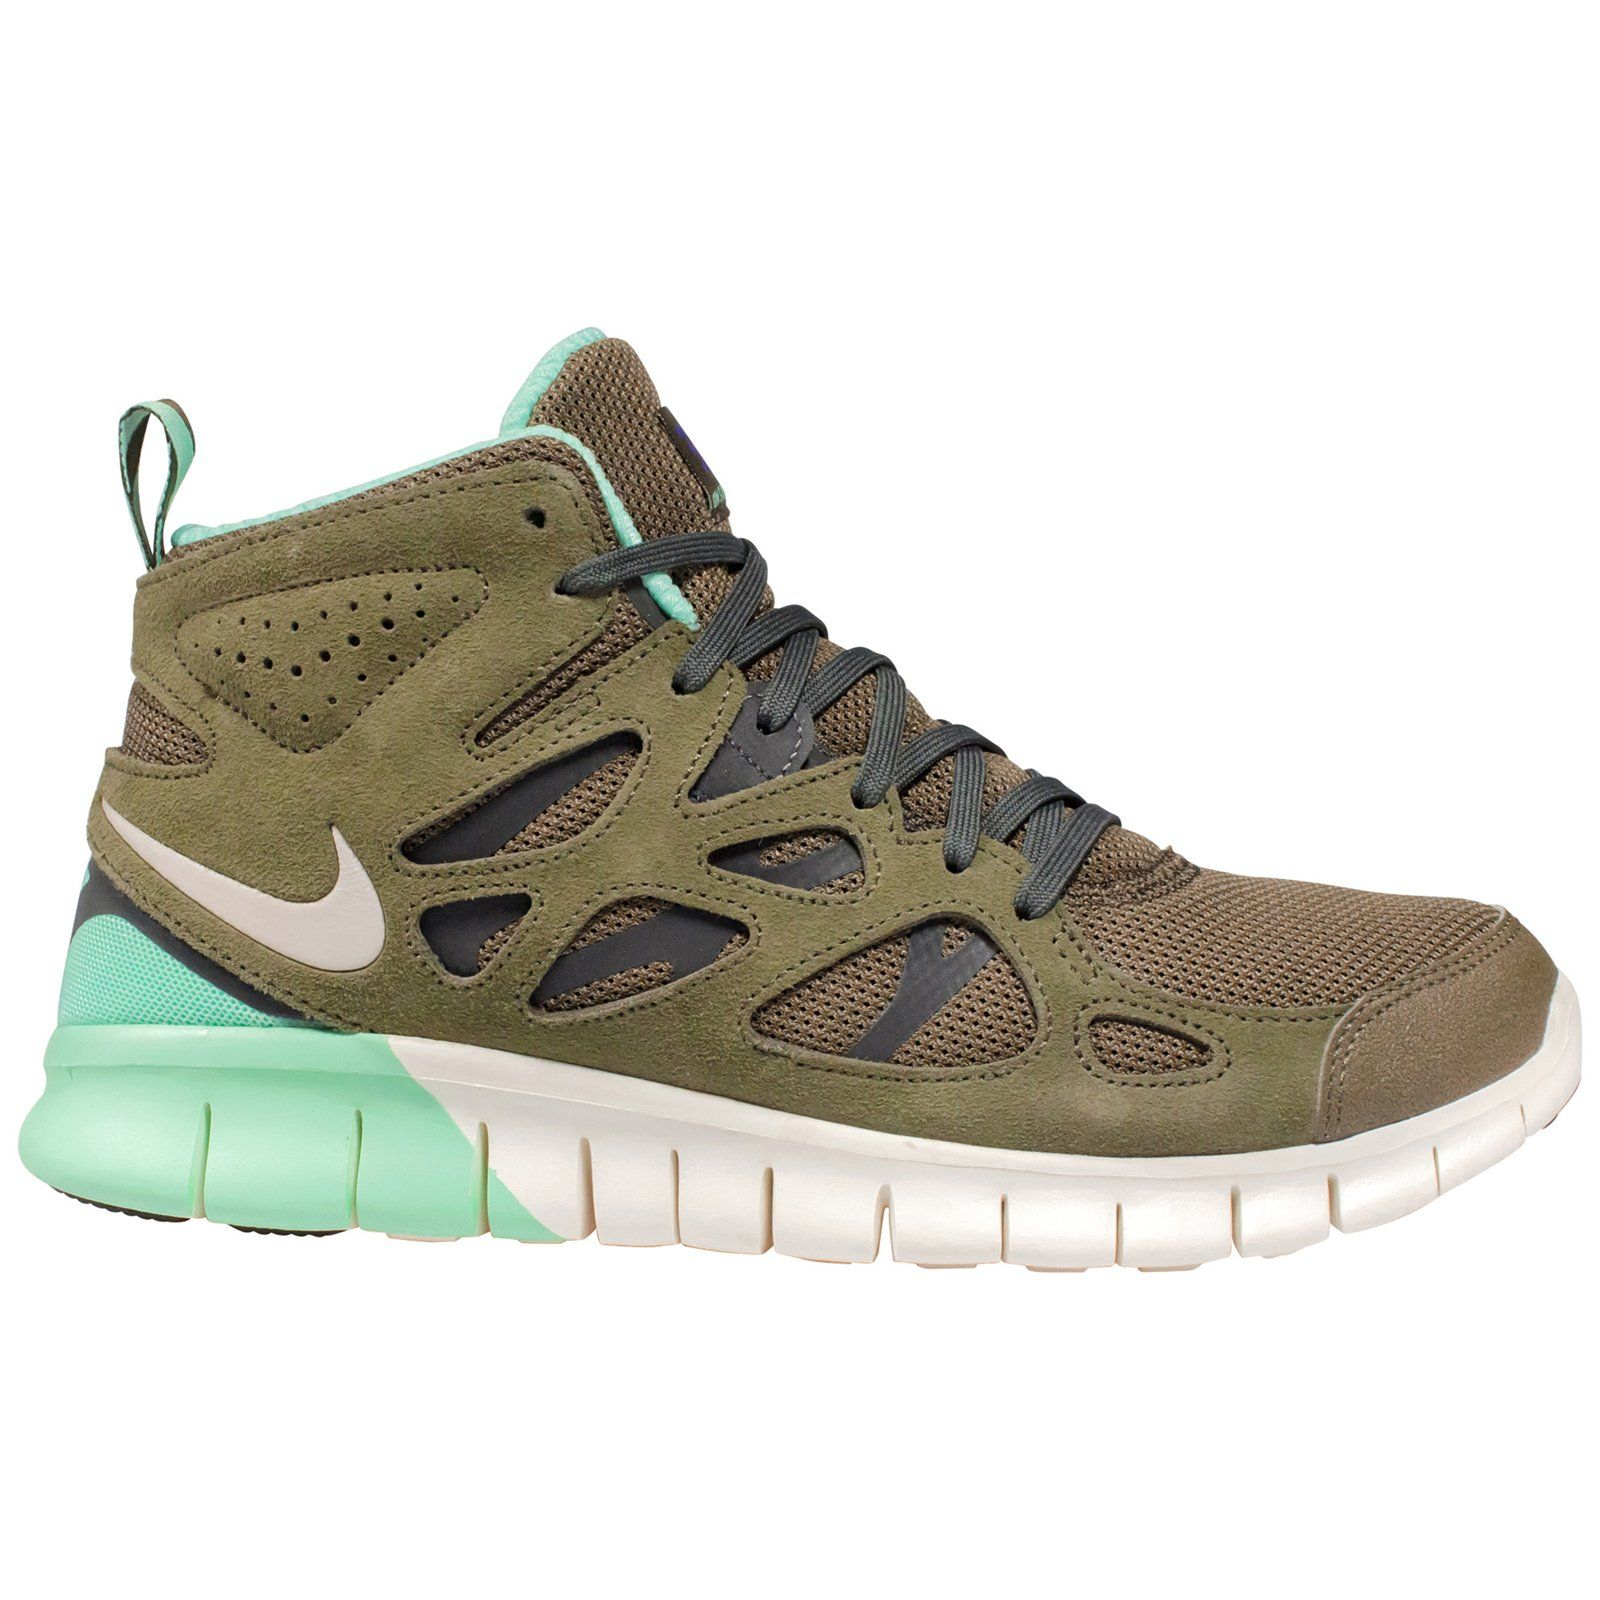 sale retailer 68fe9 d6d34 Nike Free Run 2 SneakerBoot - Medium Olive   Grey-Dark Loden-Green Glow